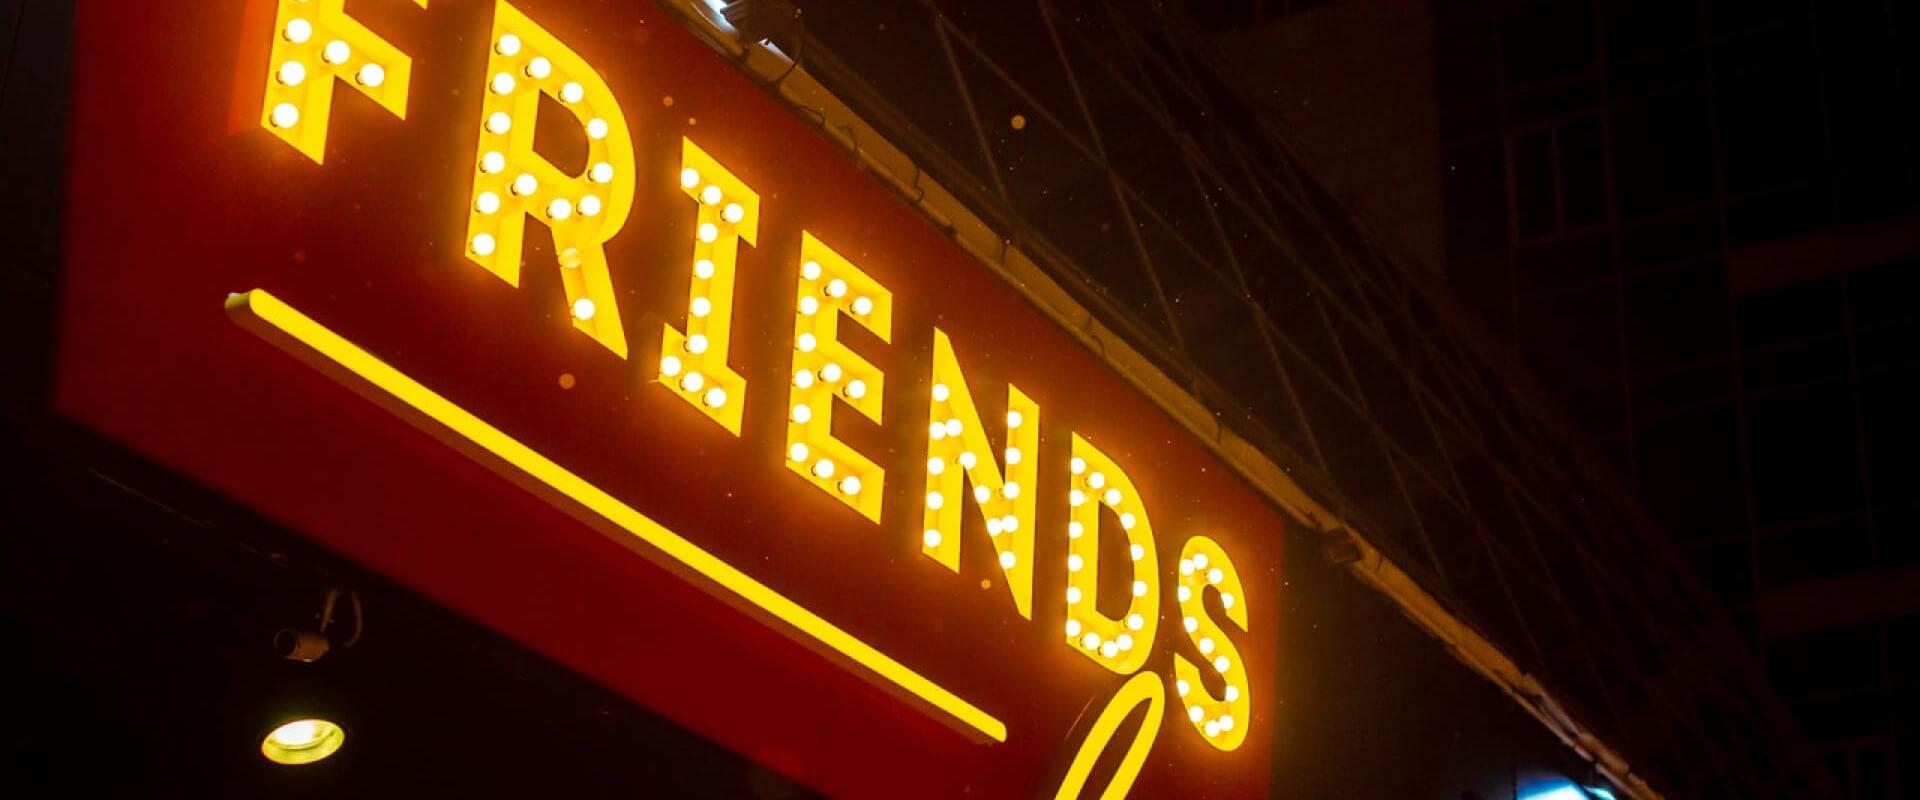 Ресторан Friends Modern Diner. Куда сходить в Екатеринбурге